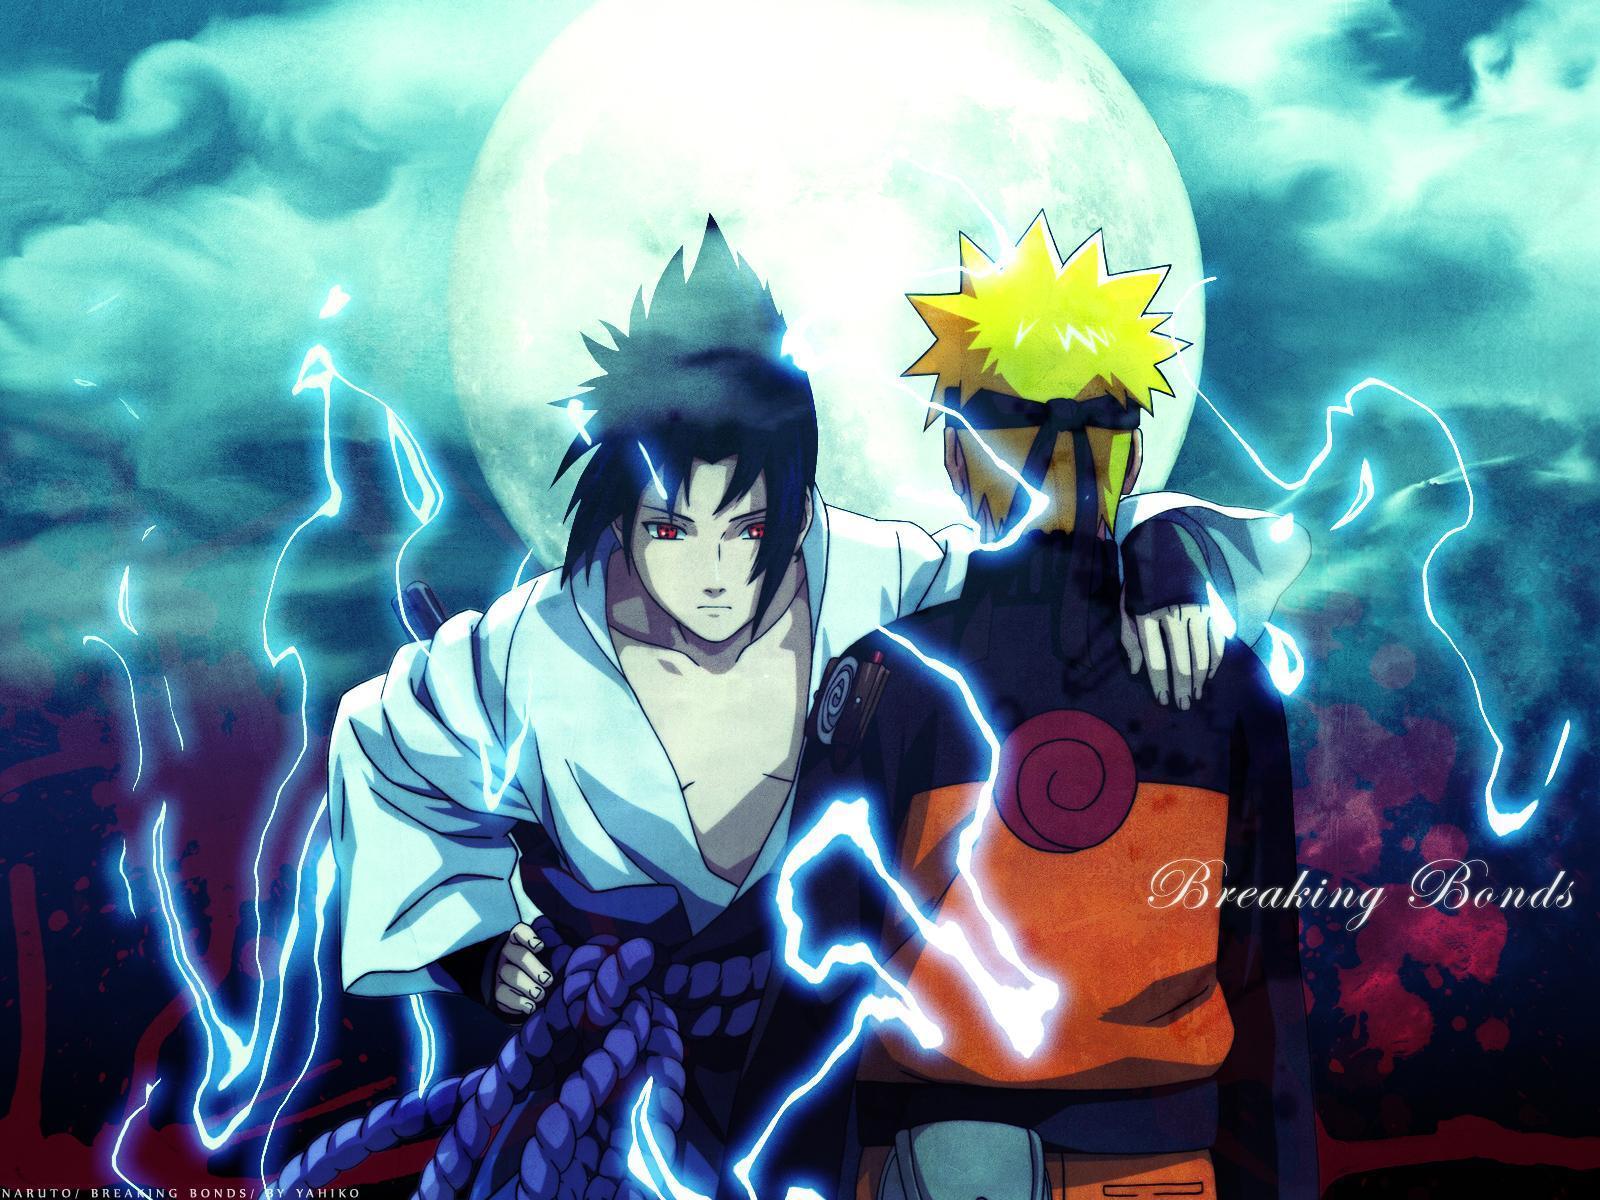 Naruto Shippuuden images NARUTO VS SASUKE HD wallpaper and background 1600x1200